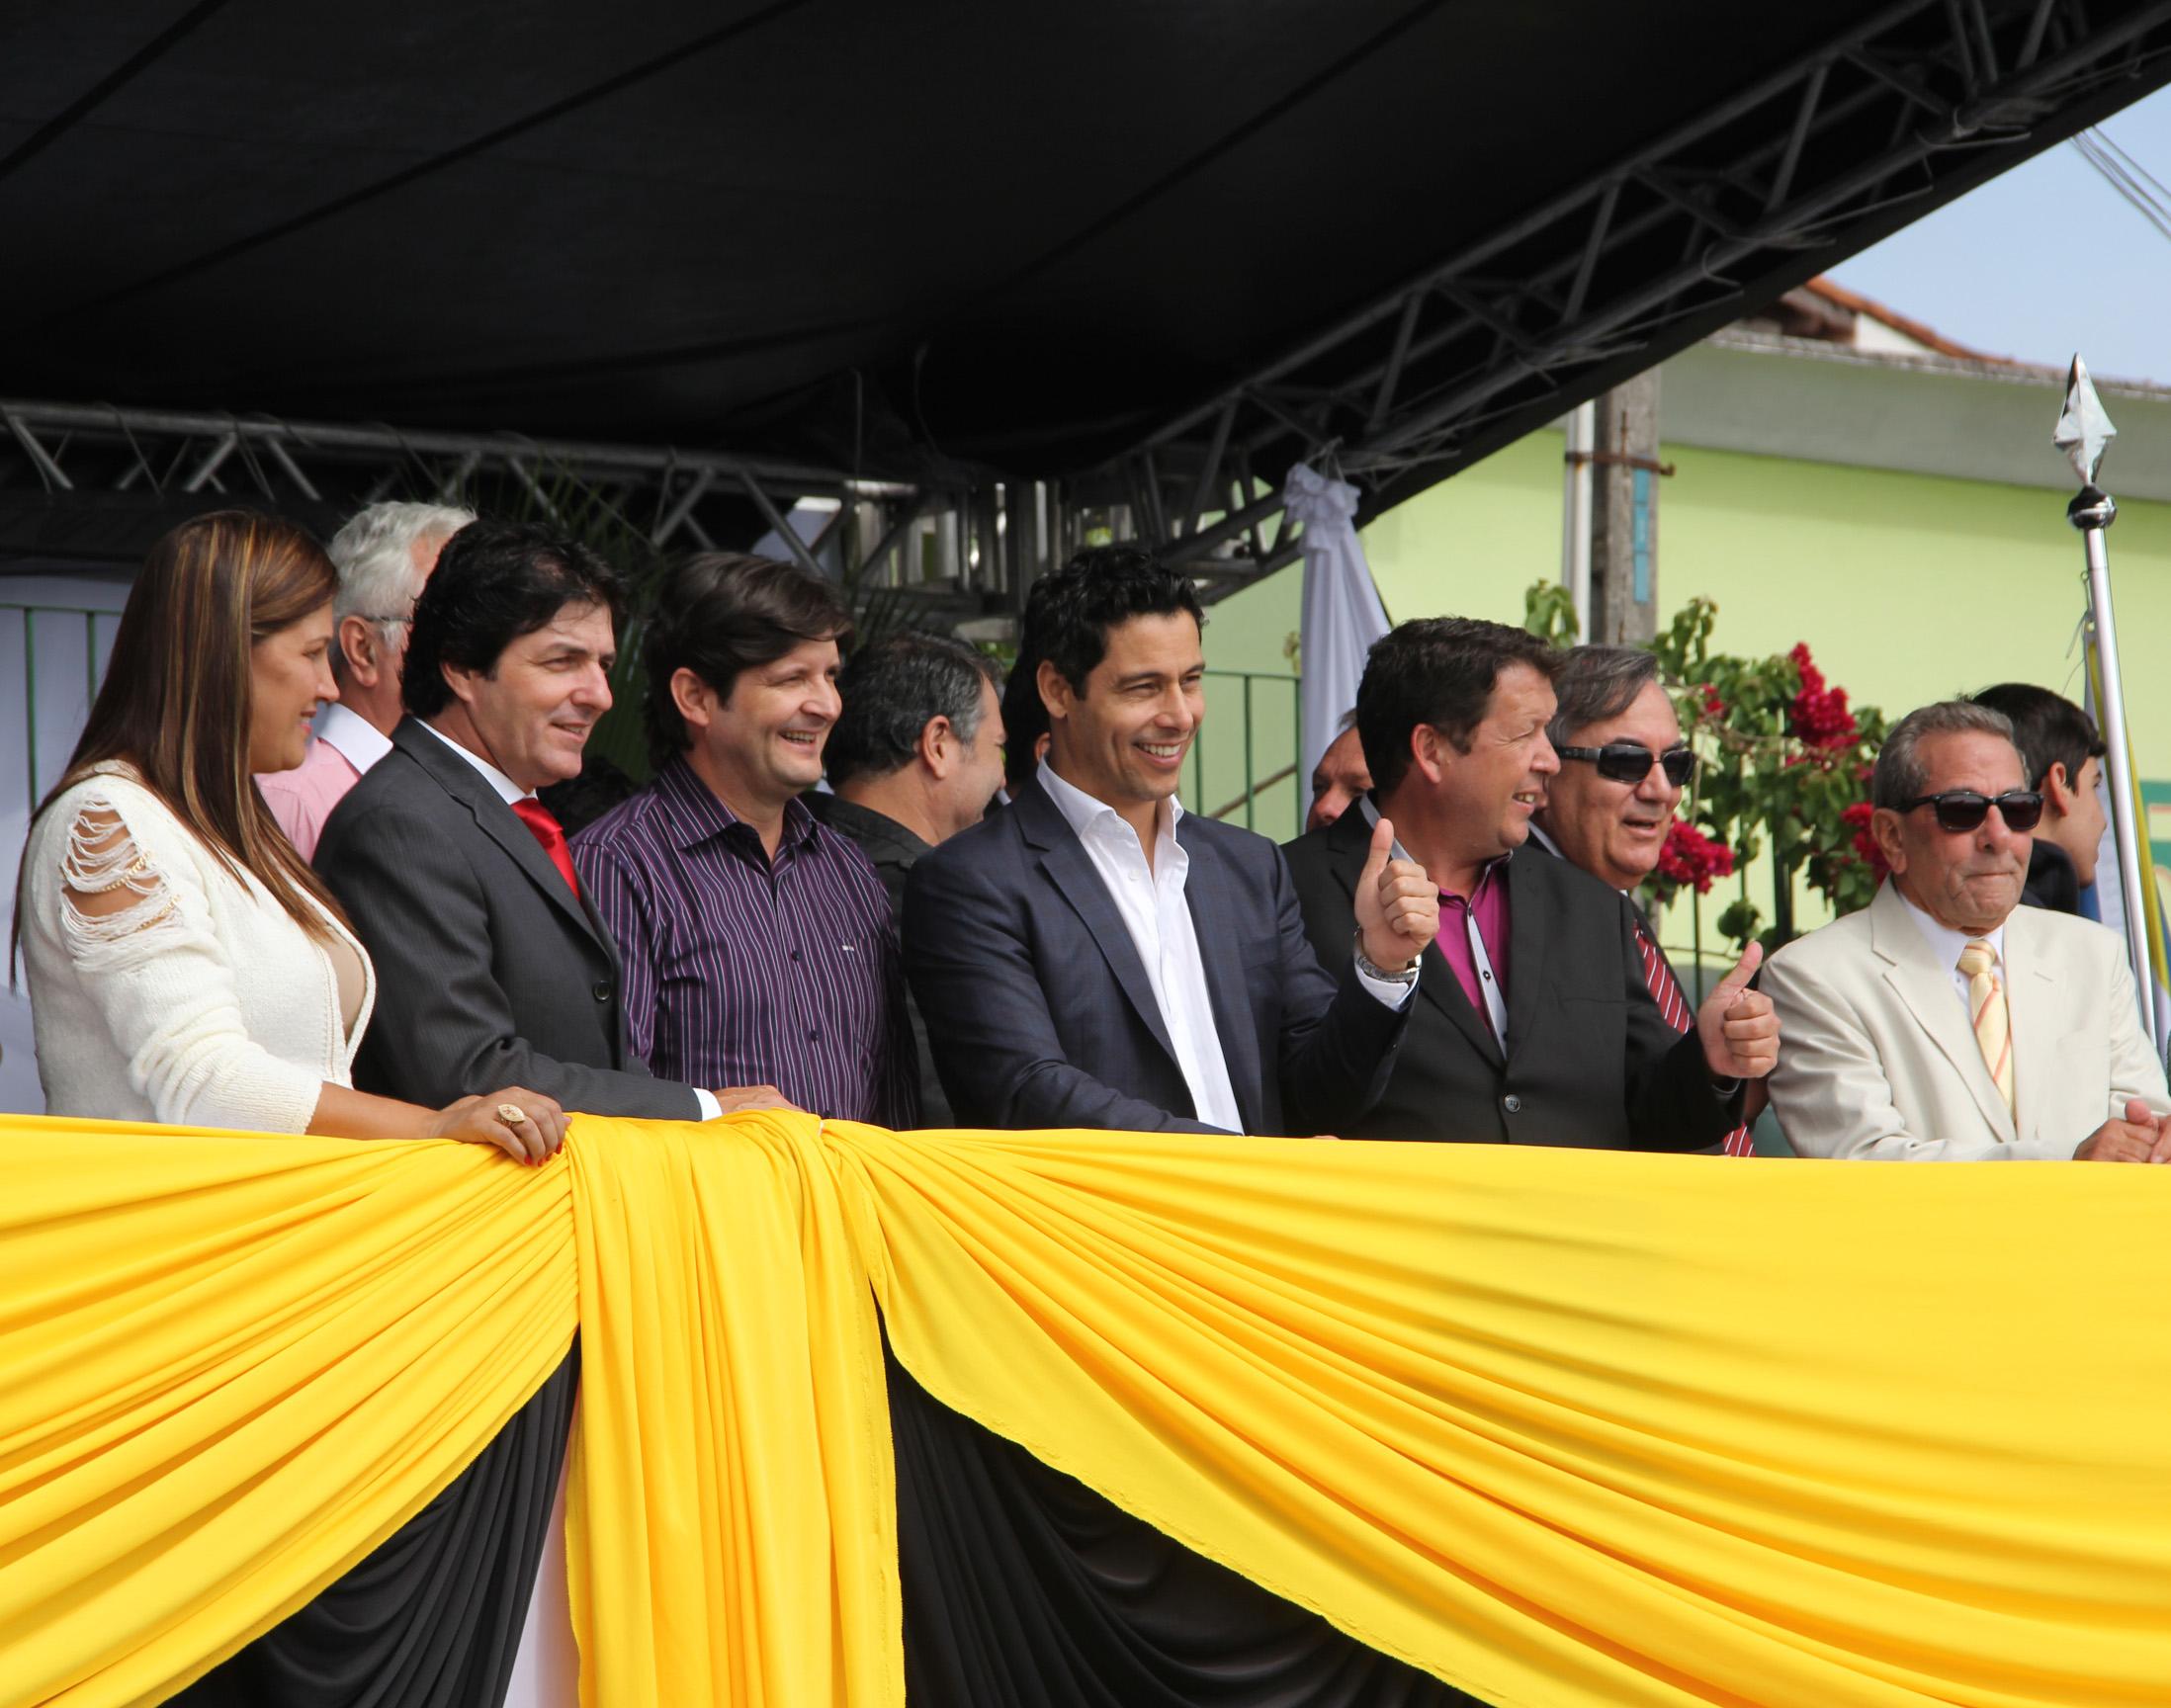 Foto Desfile de Biritiba - CREDITO RAFAEL MORAES